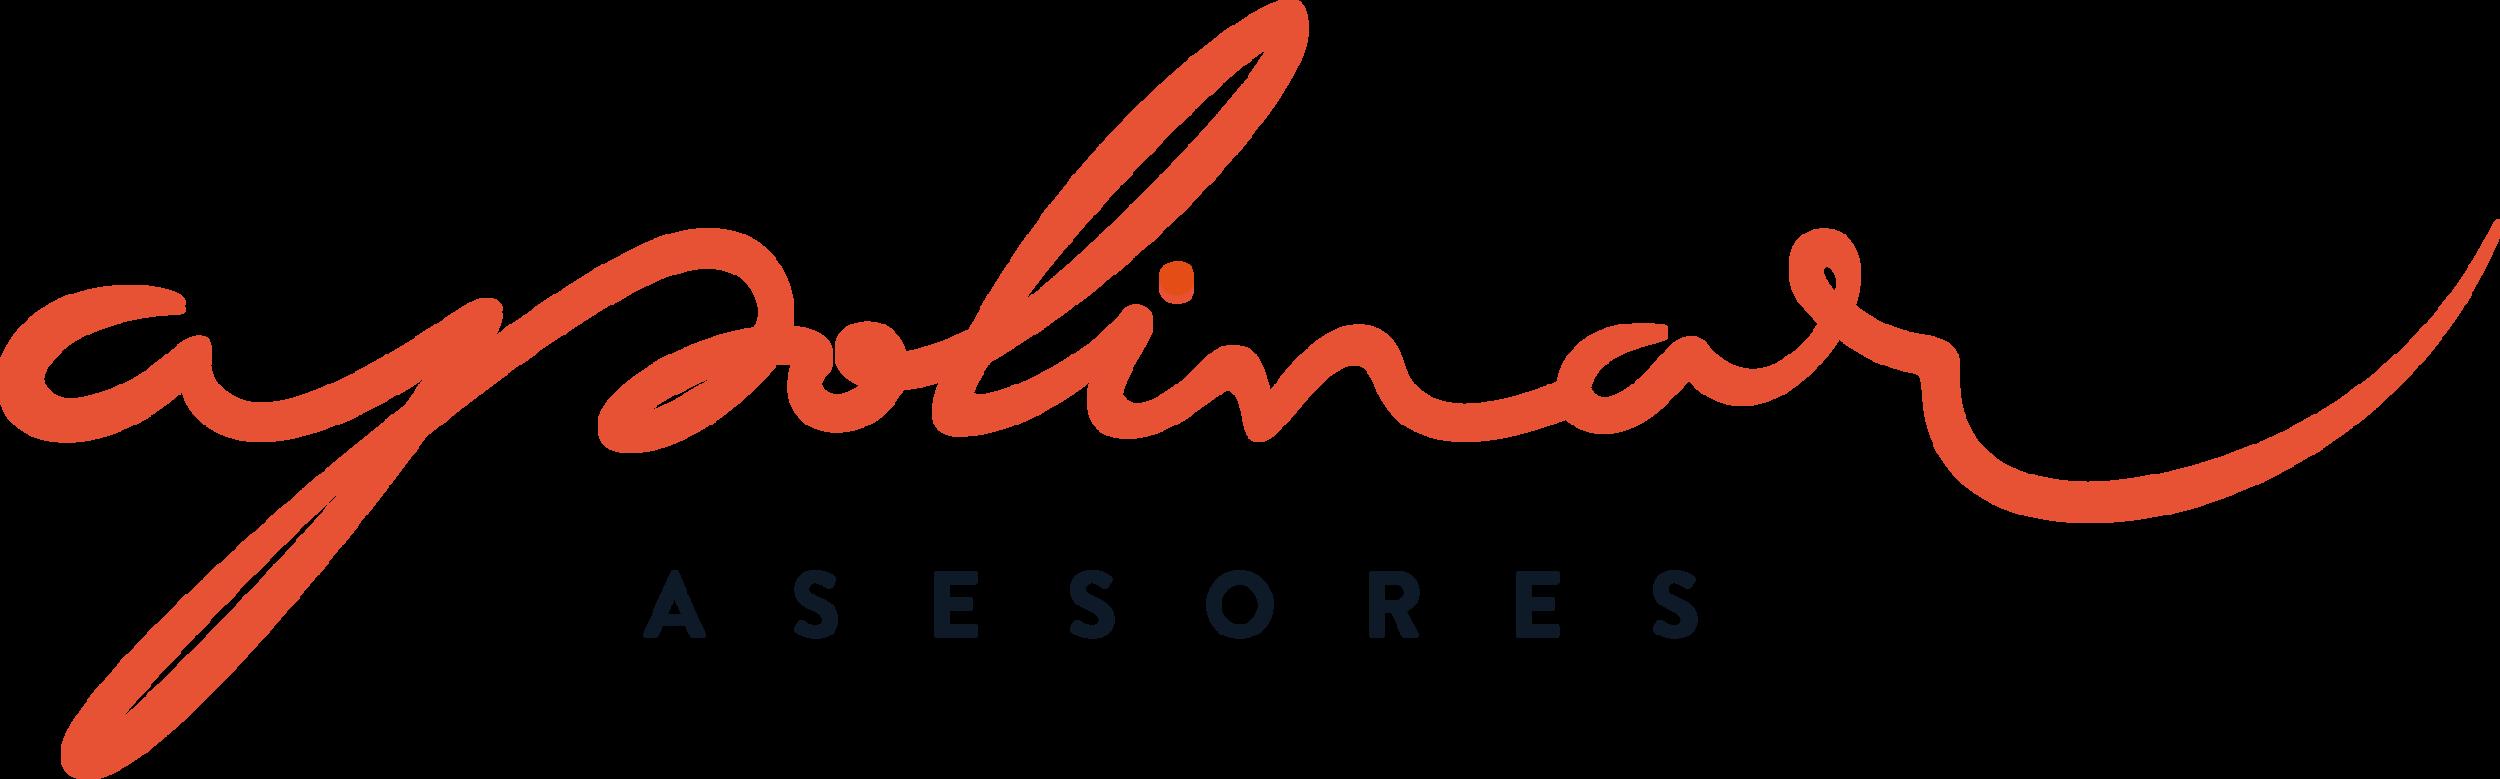 Logotipo color.png